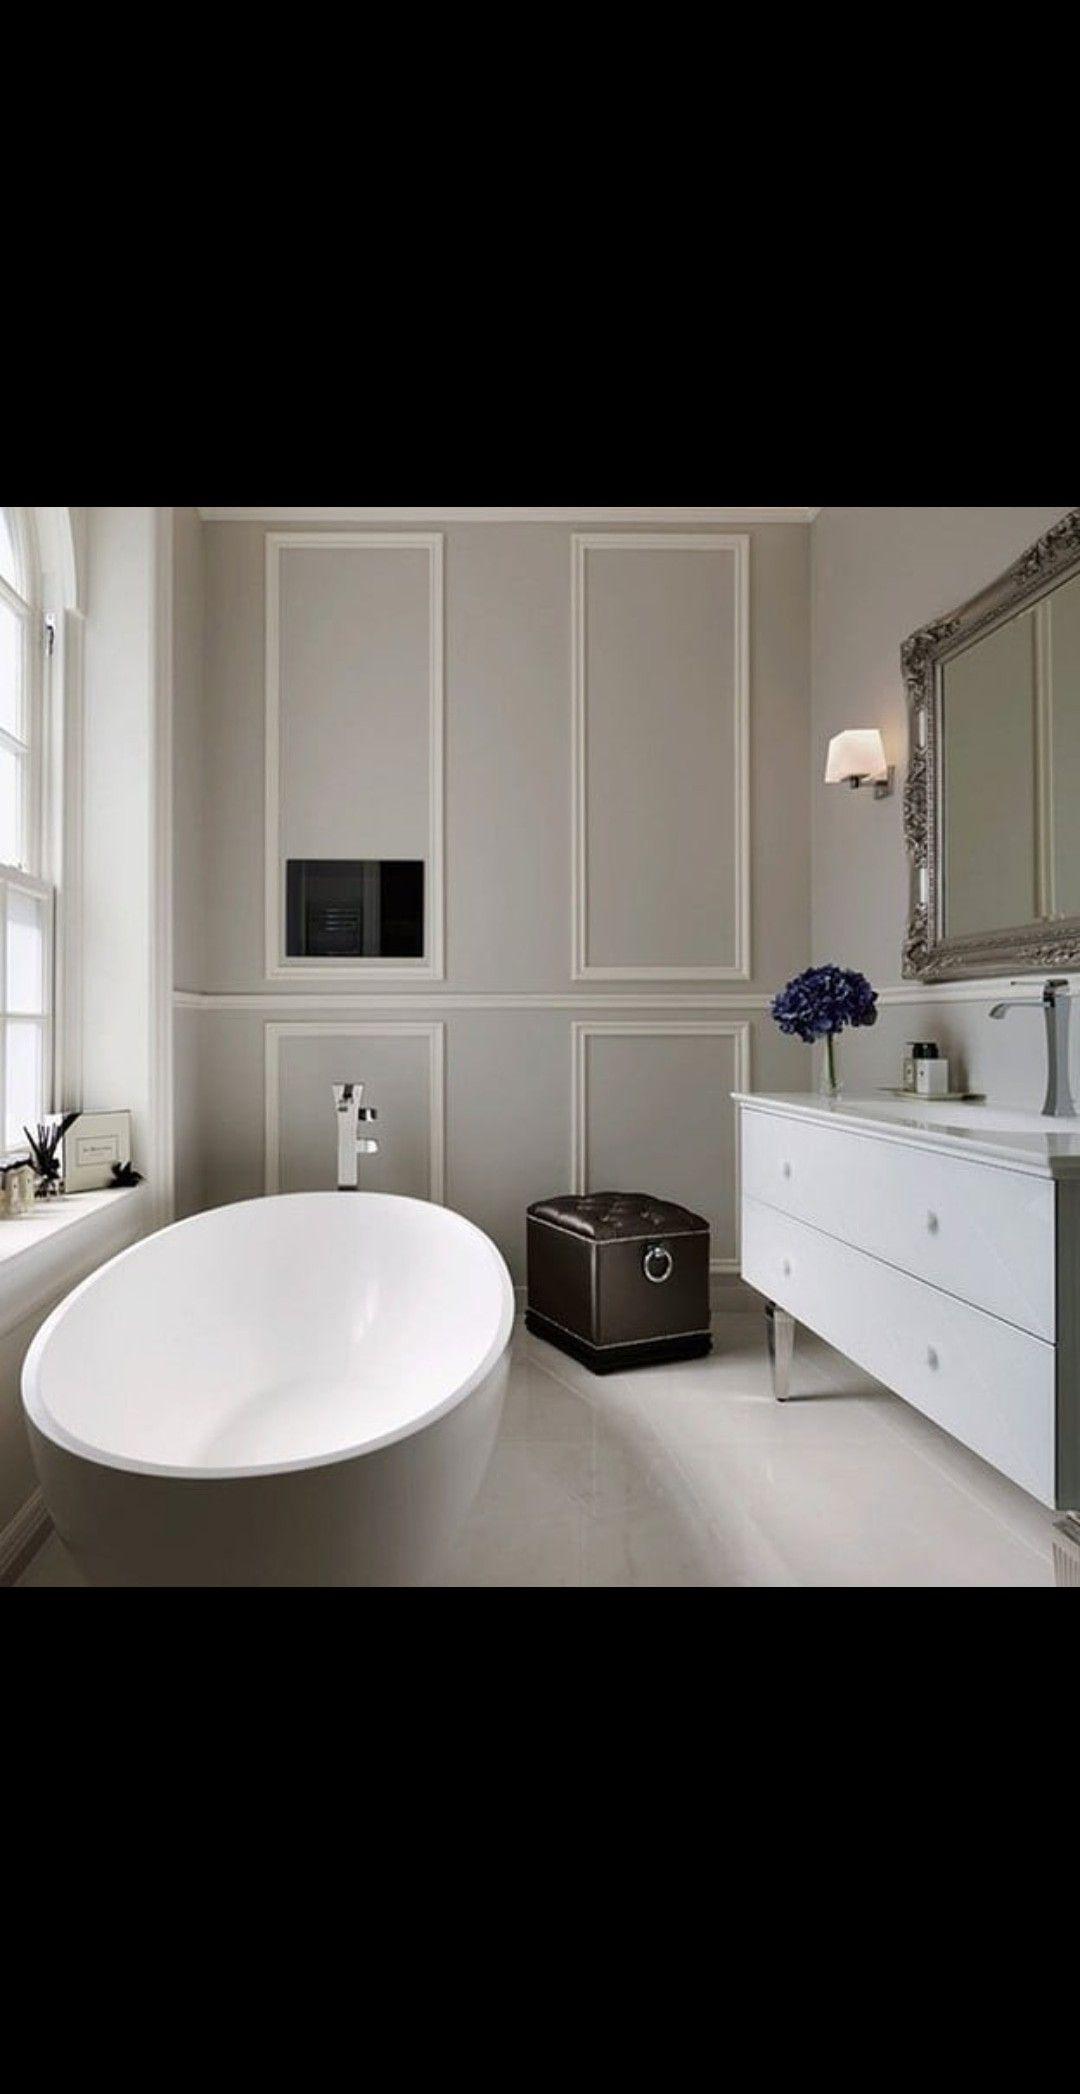 حمام الهناء Double Vanity Vanity Bathroom Vanity